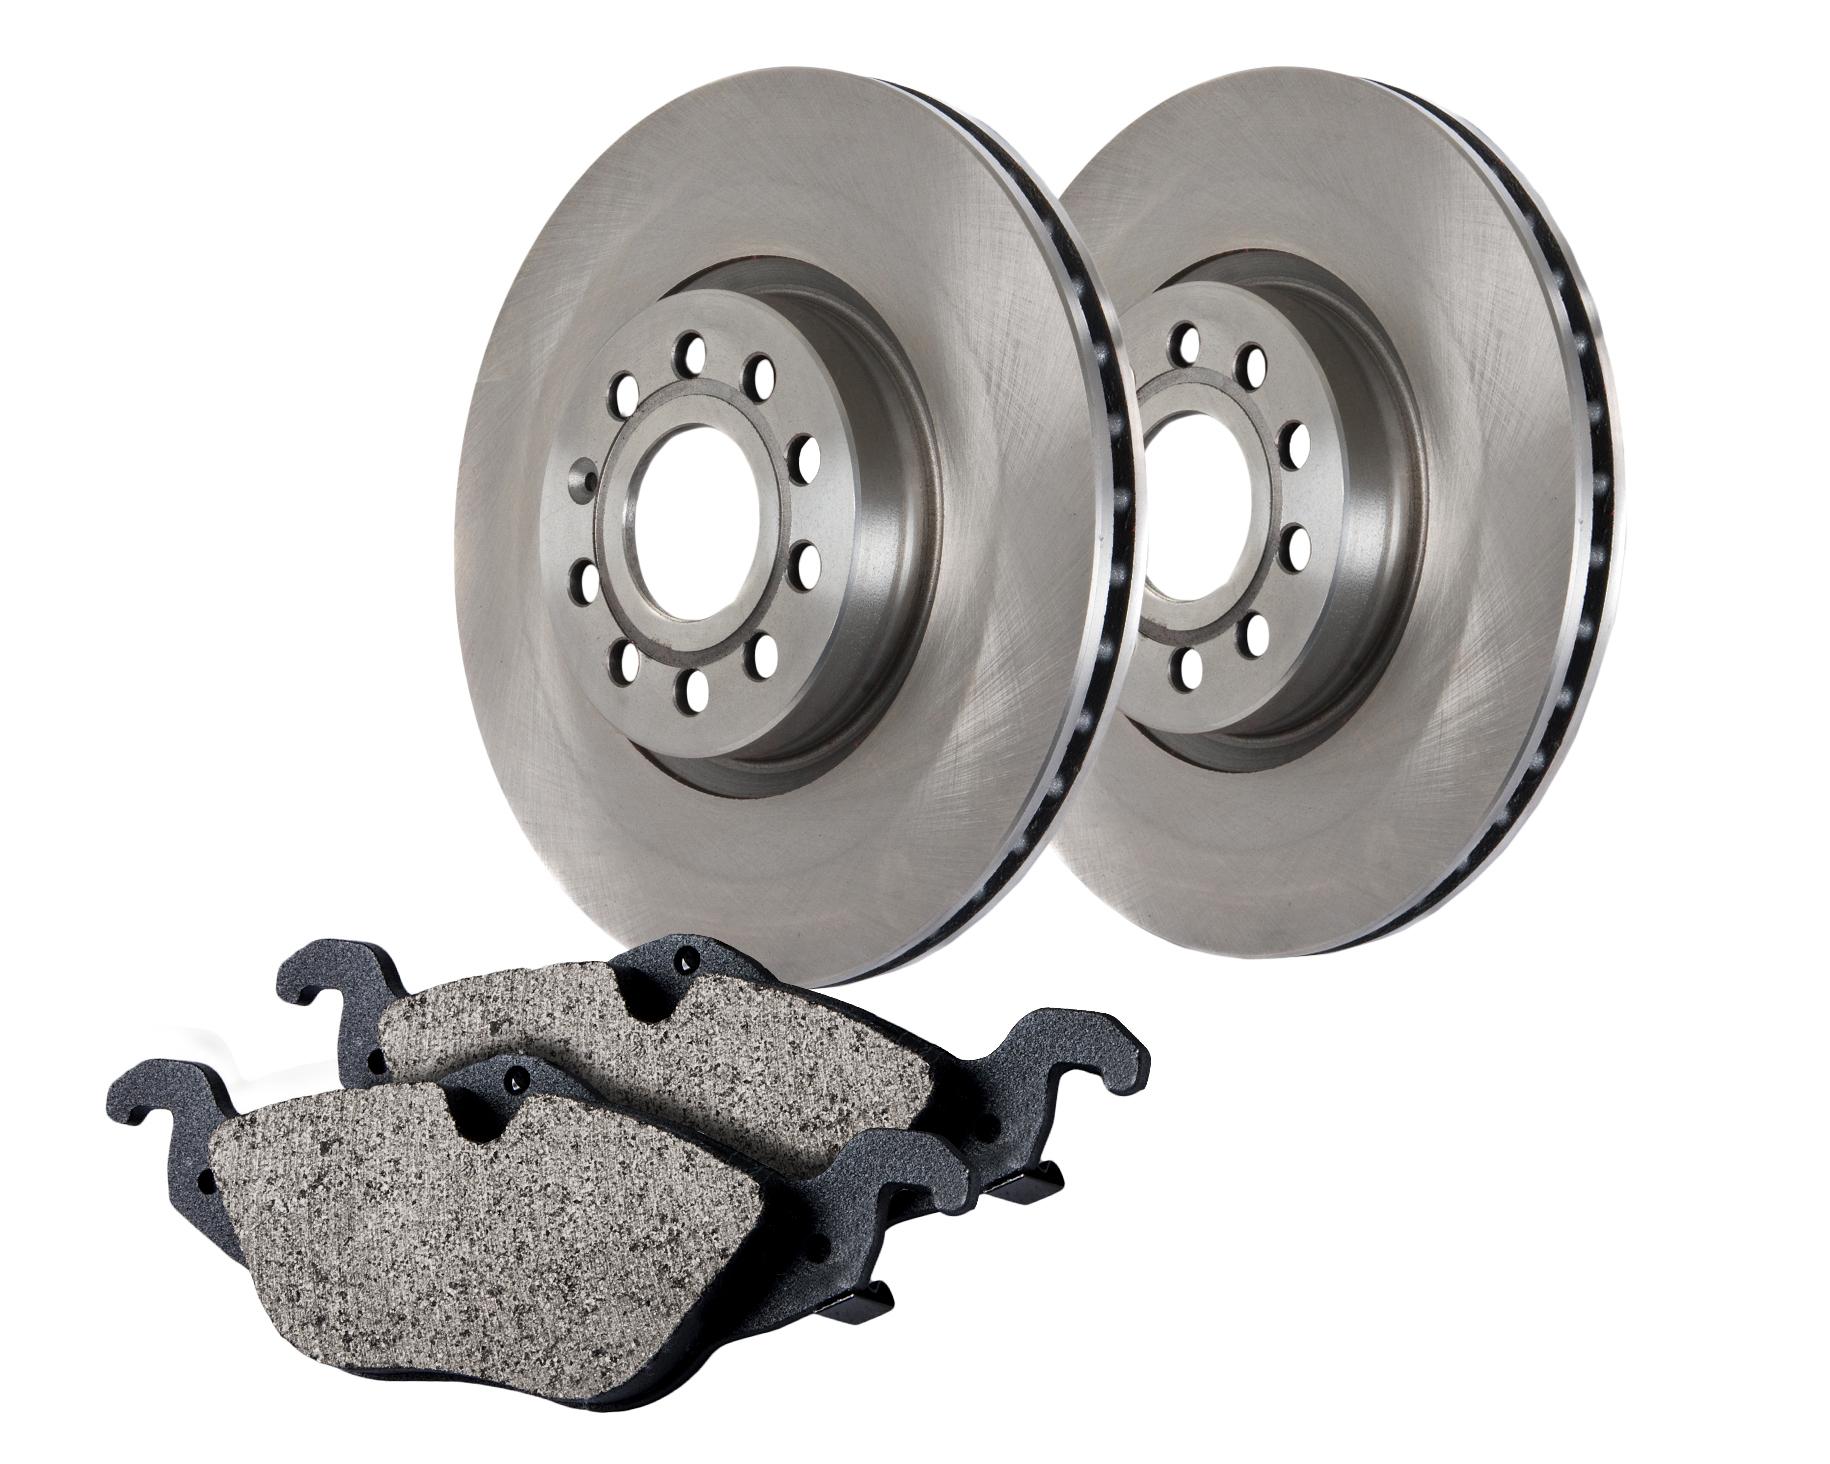 Centric Brake Parts 905.63021 Brake Rotor and Pad Kit, Premium, Semi-Metallic Pads, Iron, Natural, Dodge / Plymouth Neon 1995-99, Kit